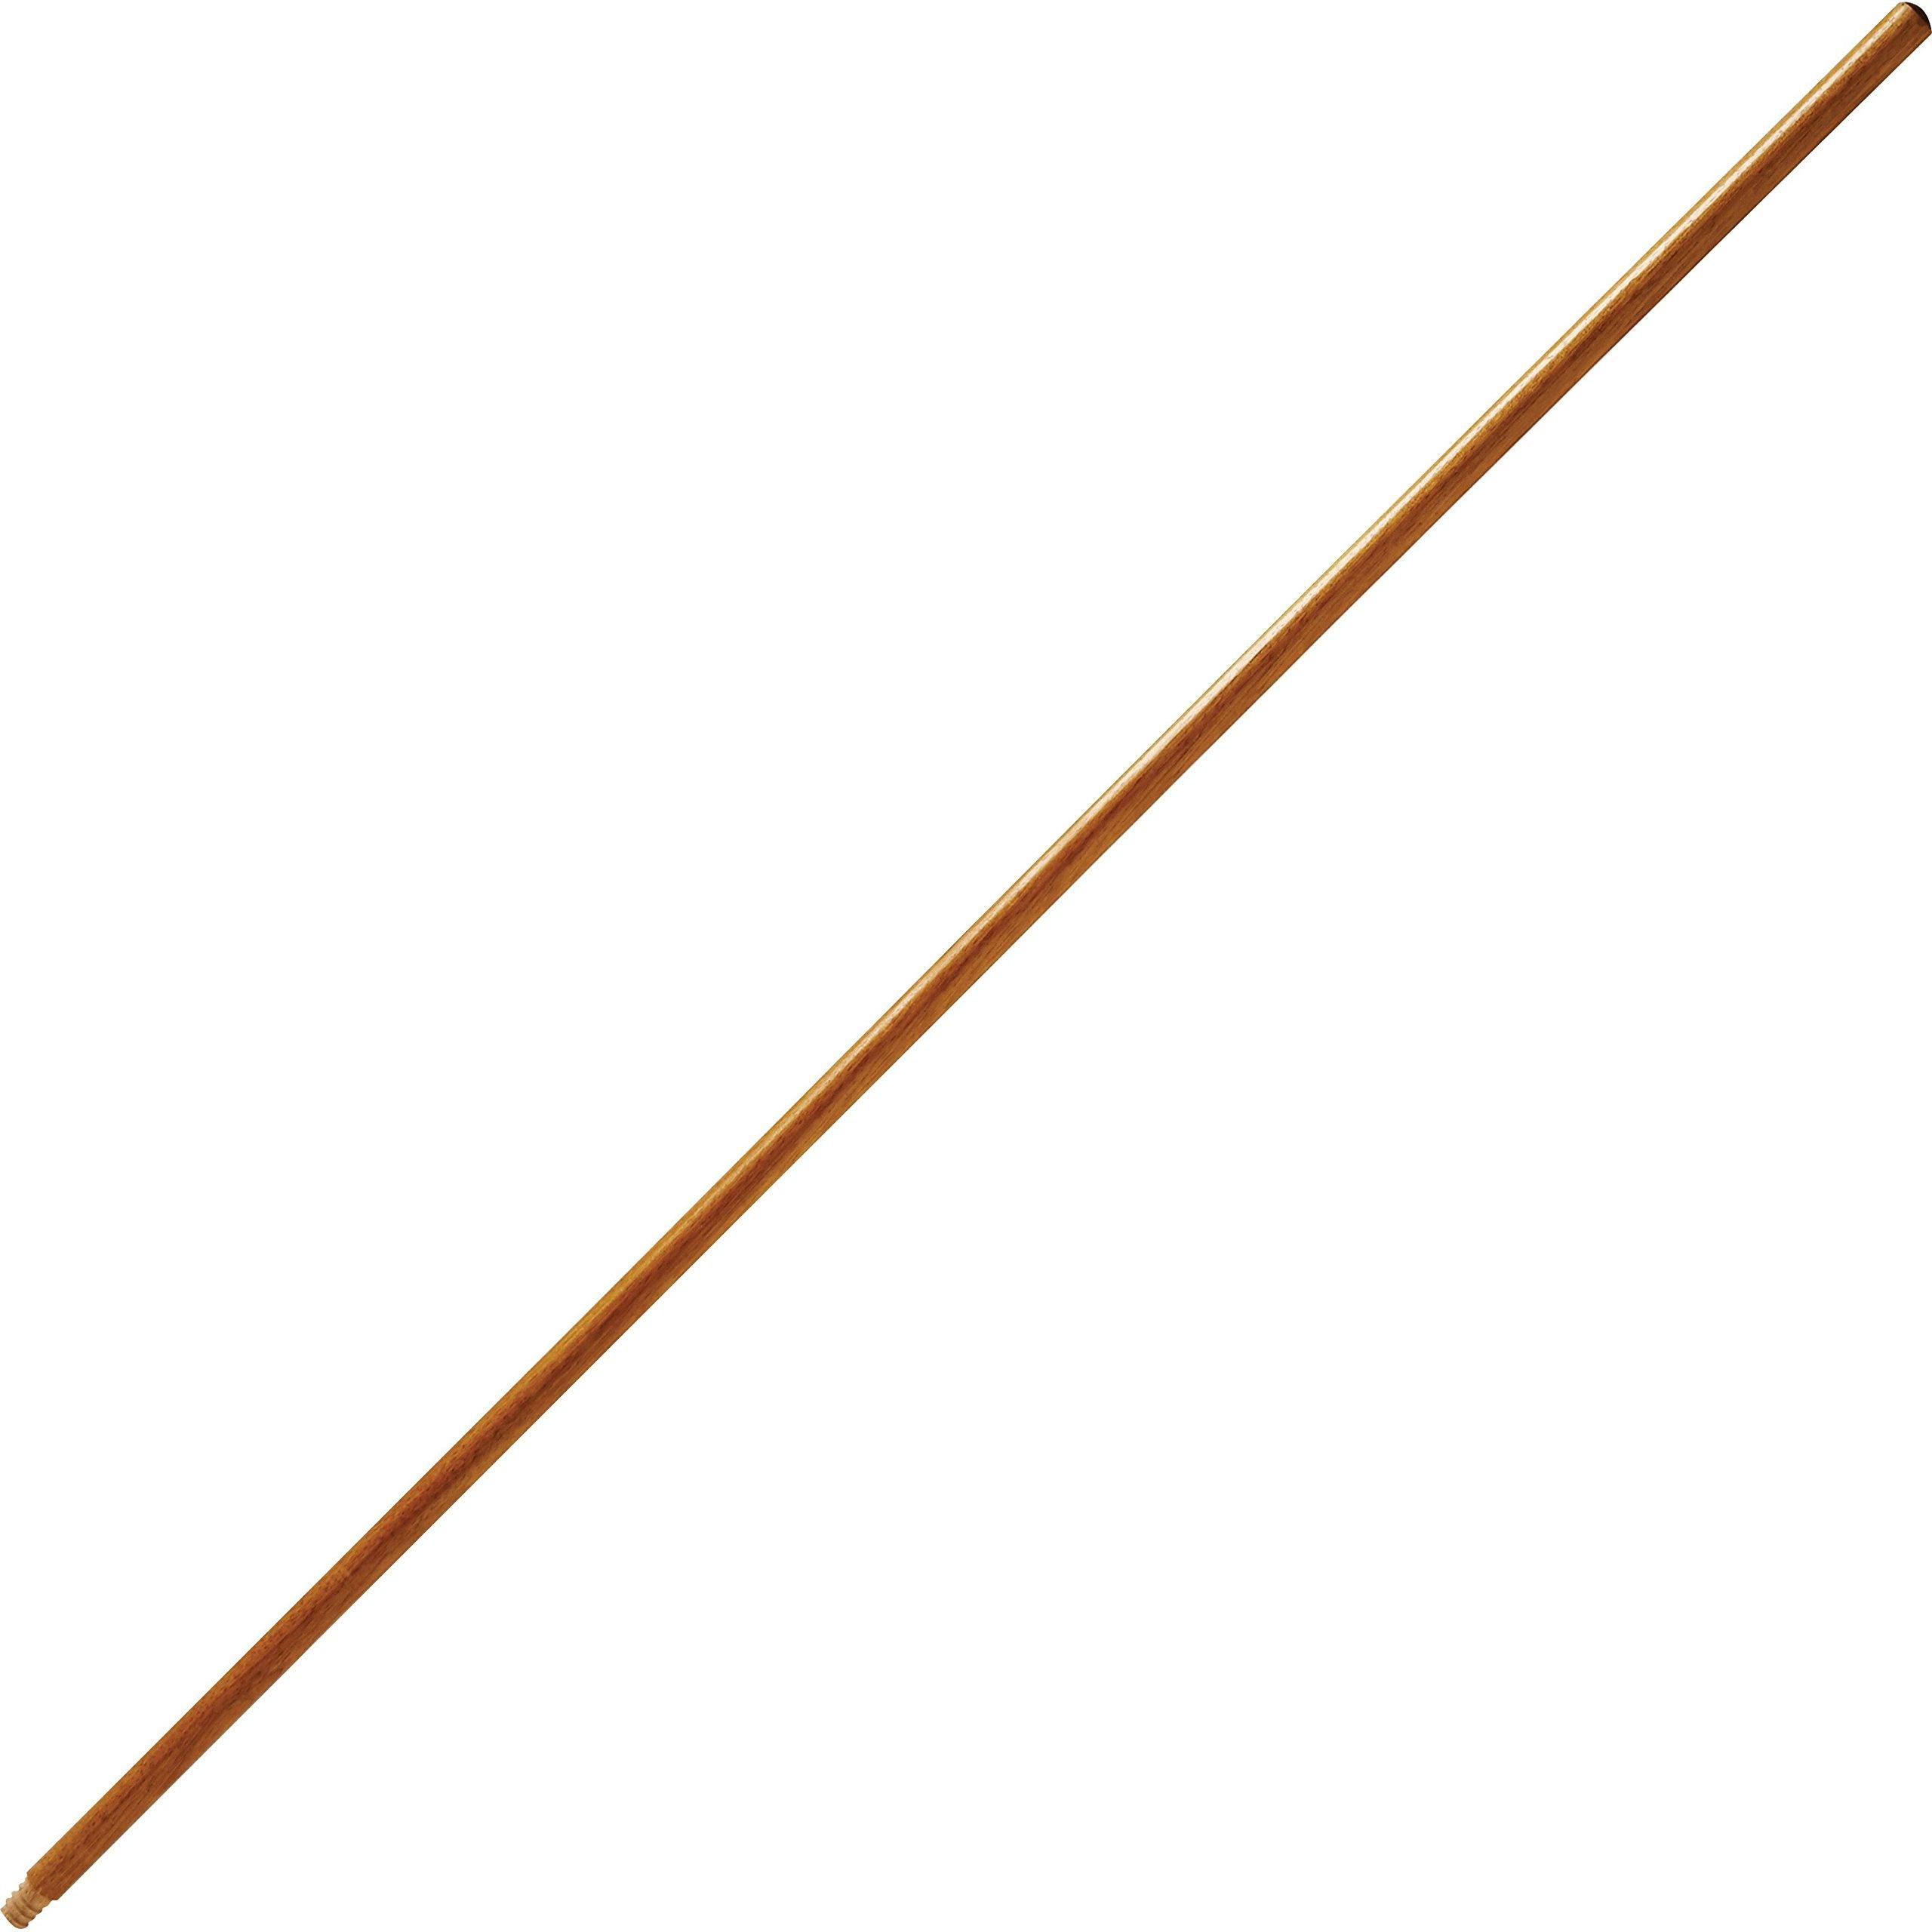 Rubbermaid 635100LAC Wood Handle, f/Fine Floor Sweep, Threaded, 54''L, Woodgrain